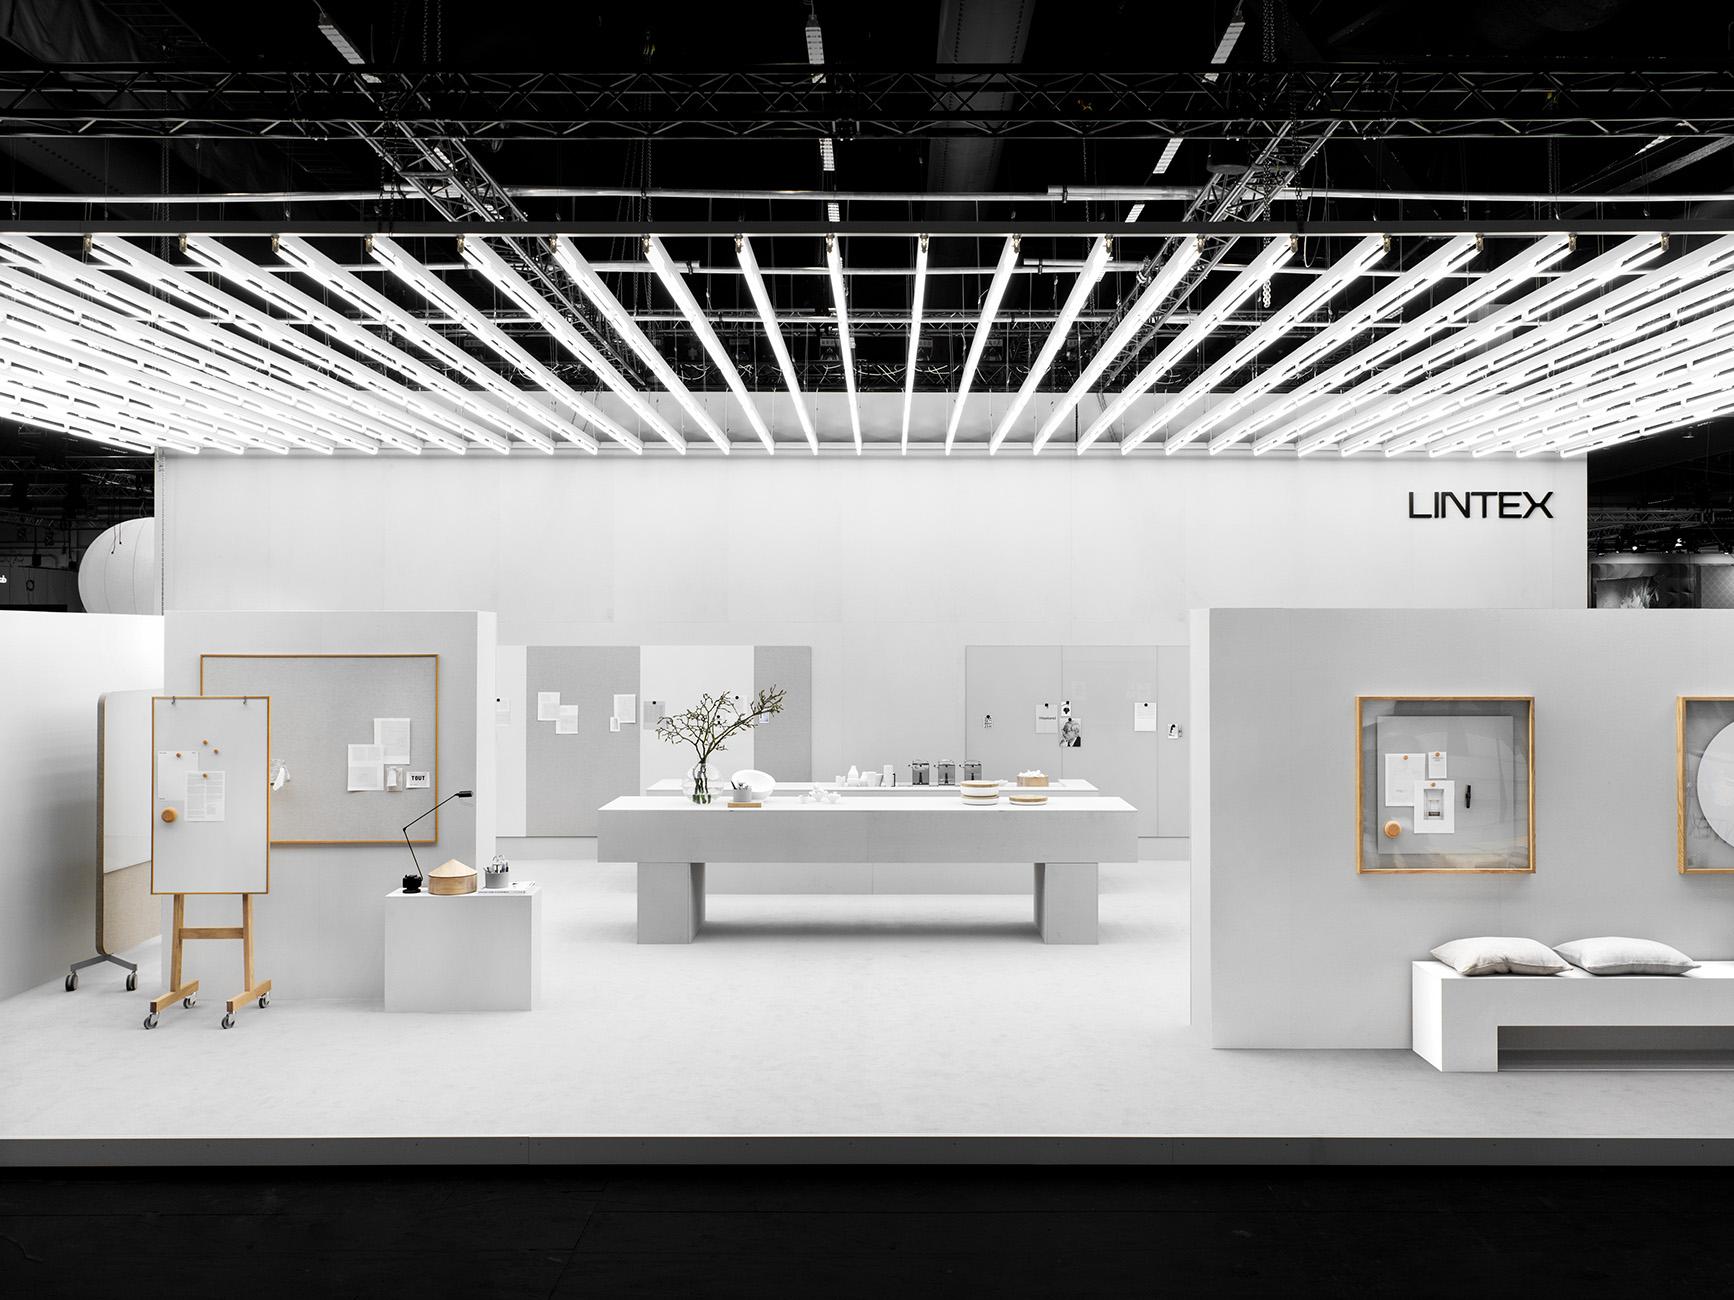 Lintex Fairstand by Halleroed